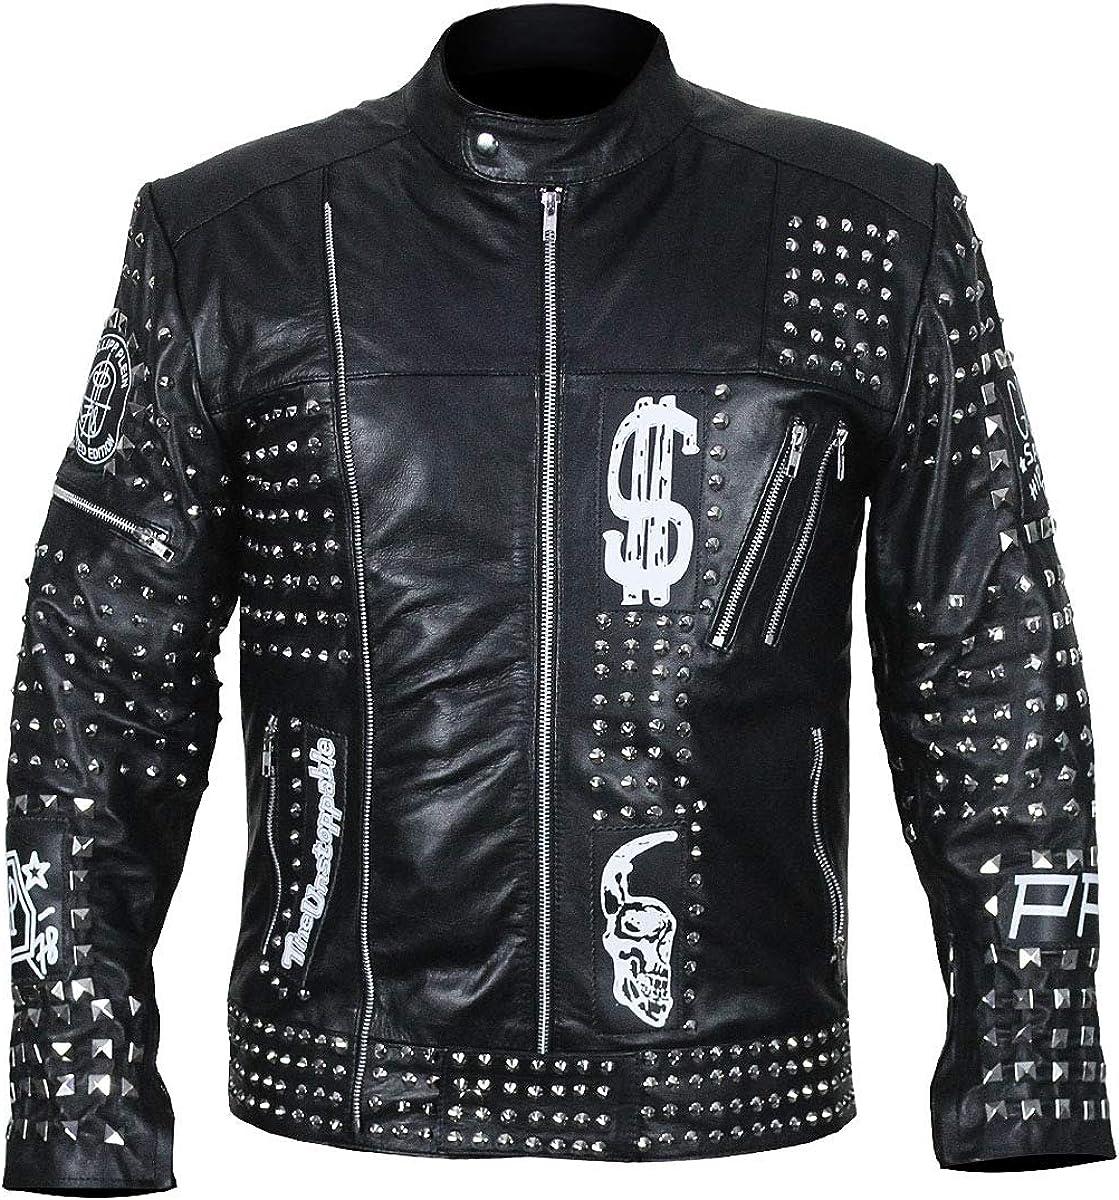 Mens Punk Rowdy Metal Rock Studded Biker Black Motorcycle Leather Jacket